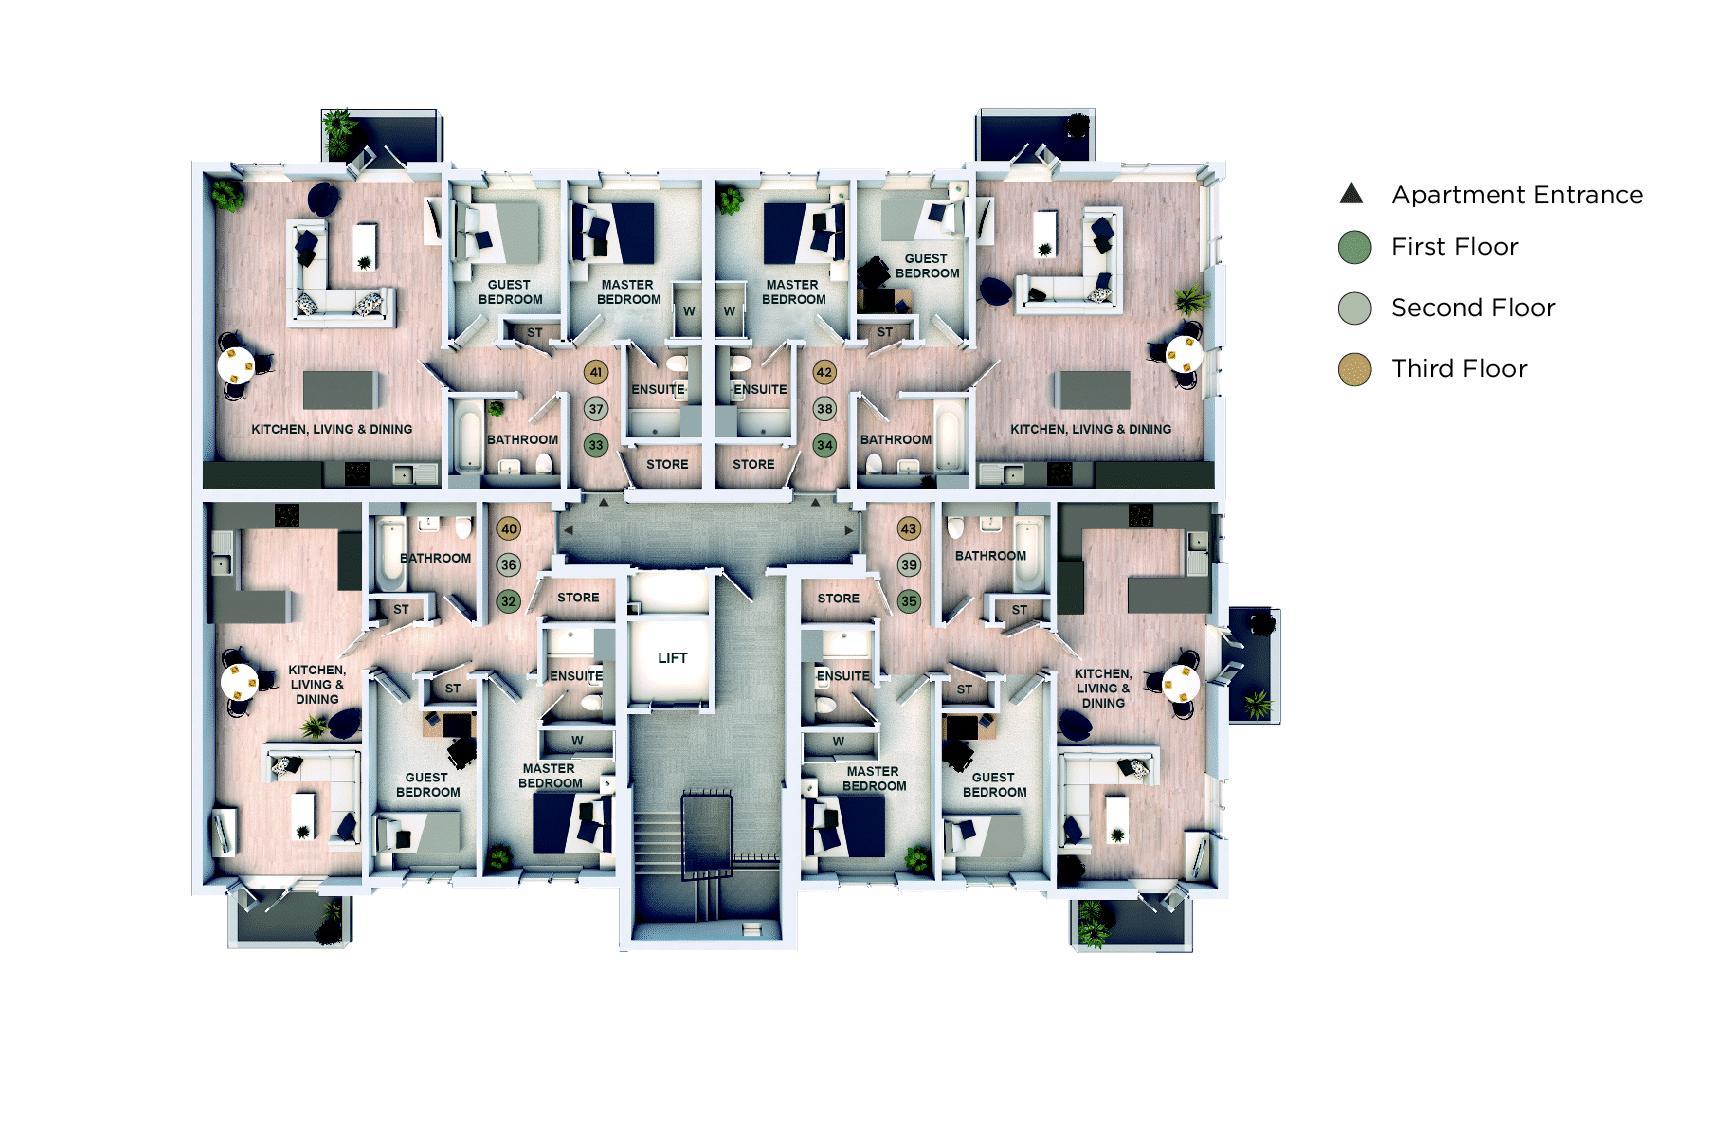 Upper Floor Apartments